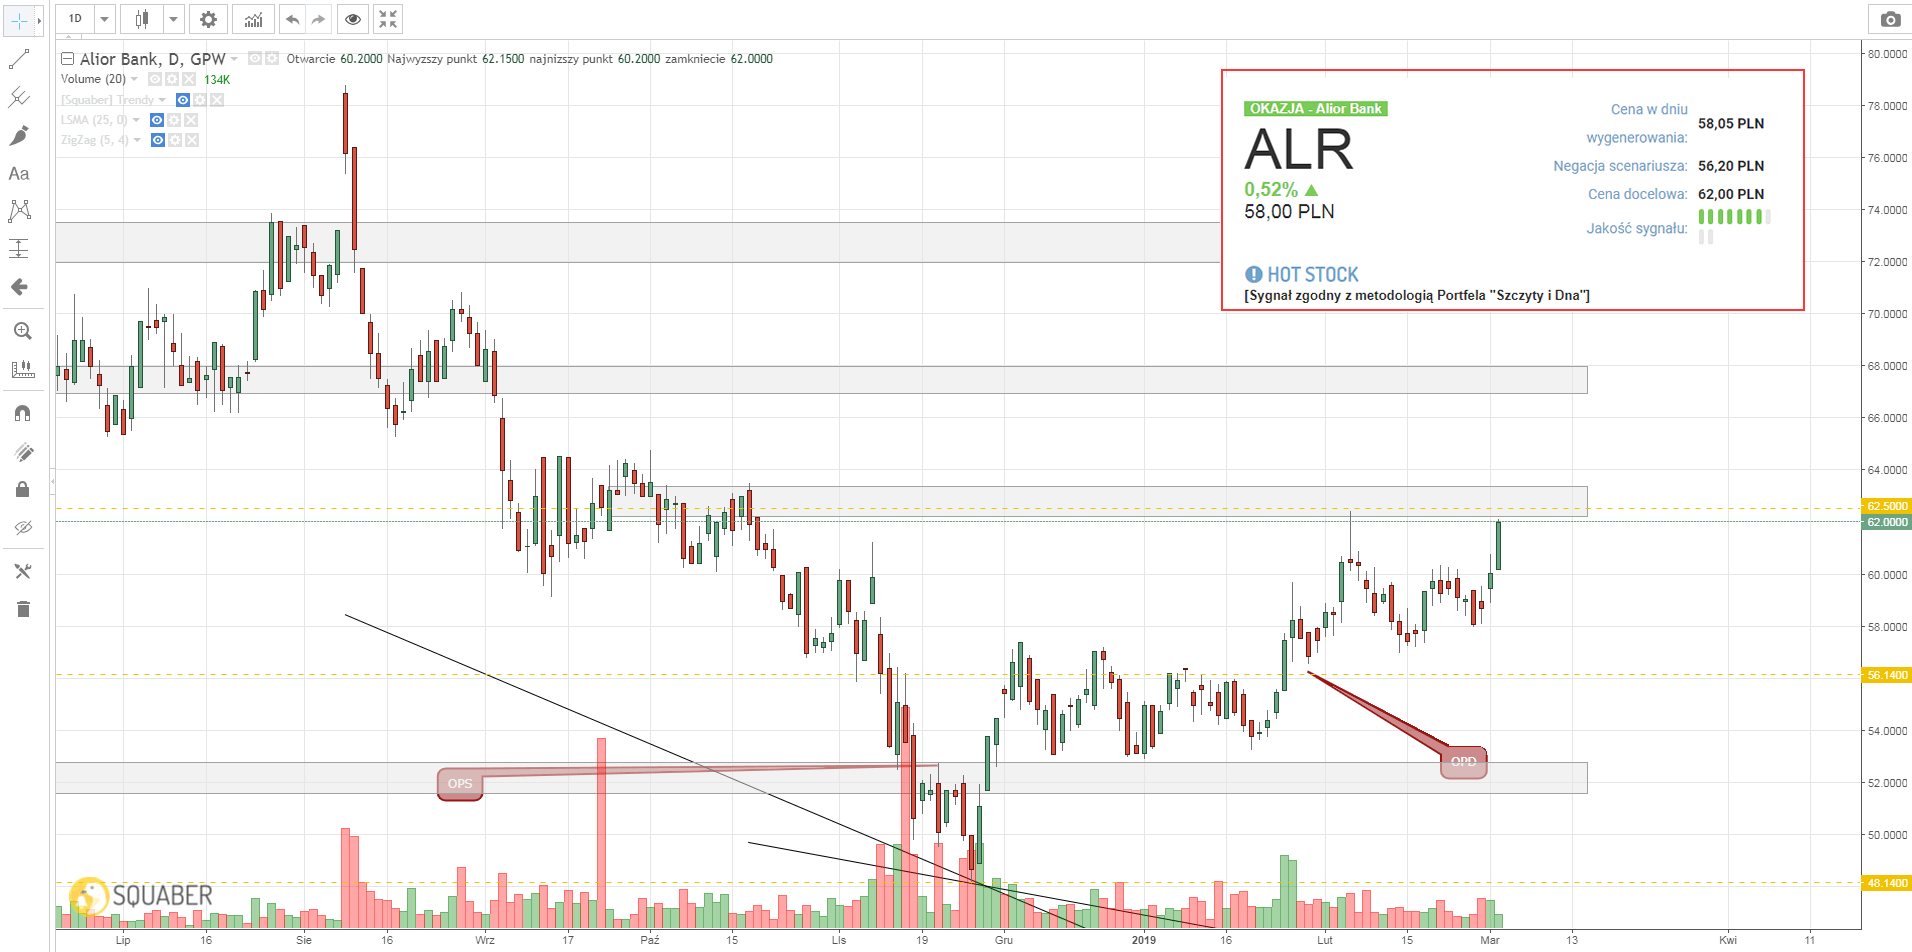 Notowania Alior Bank (ALR)